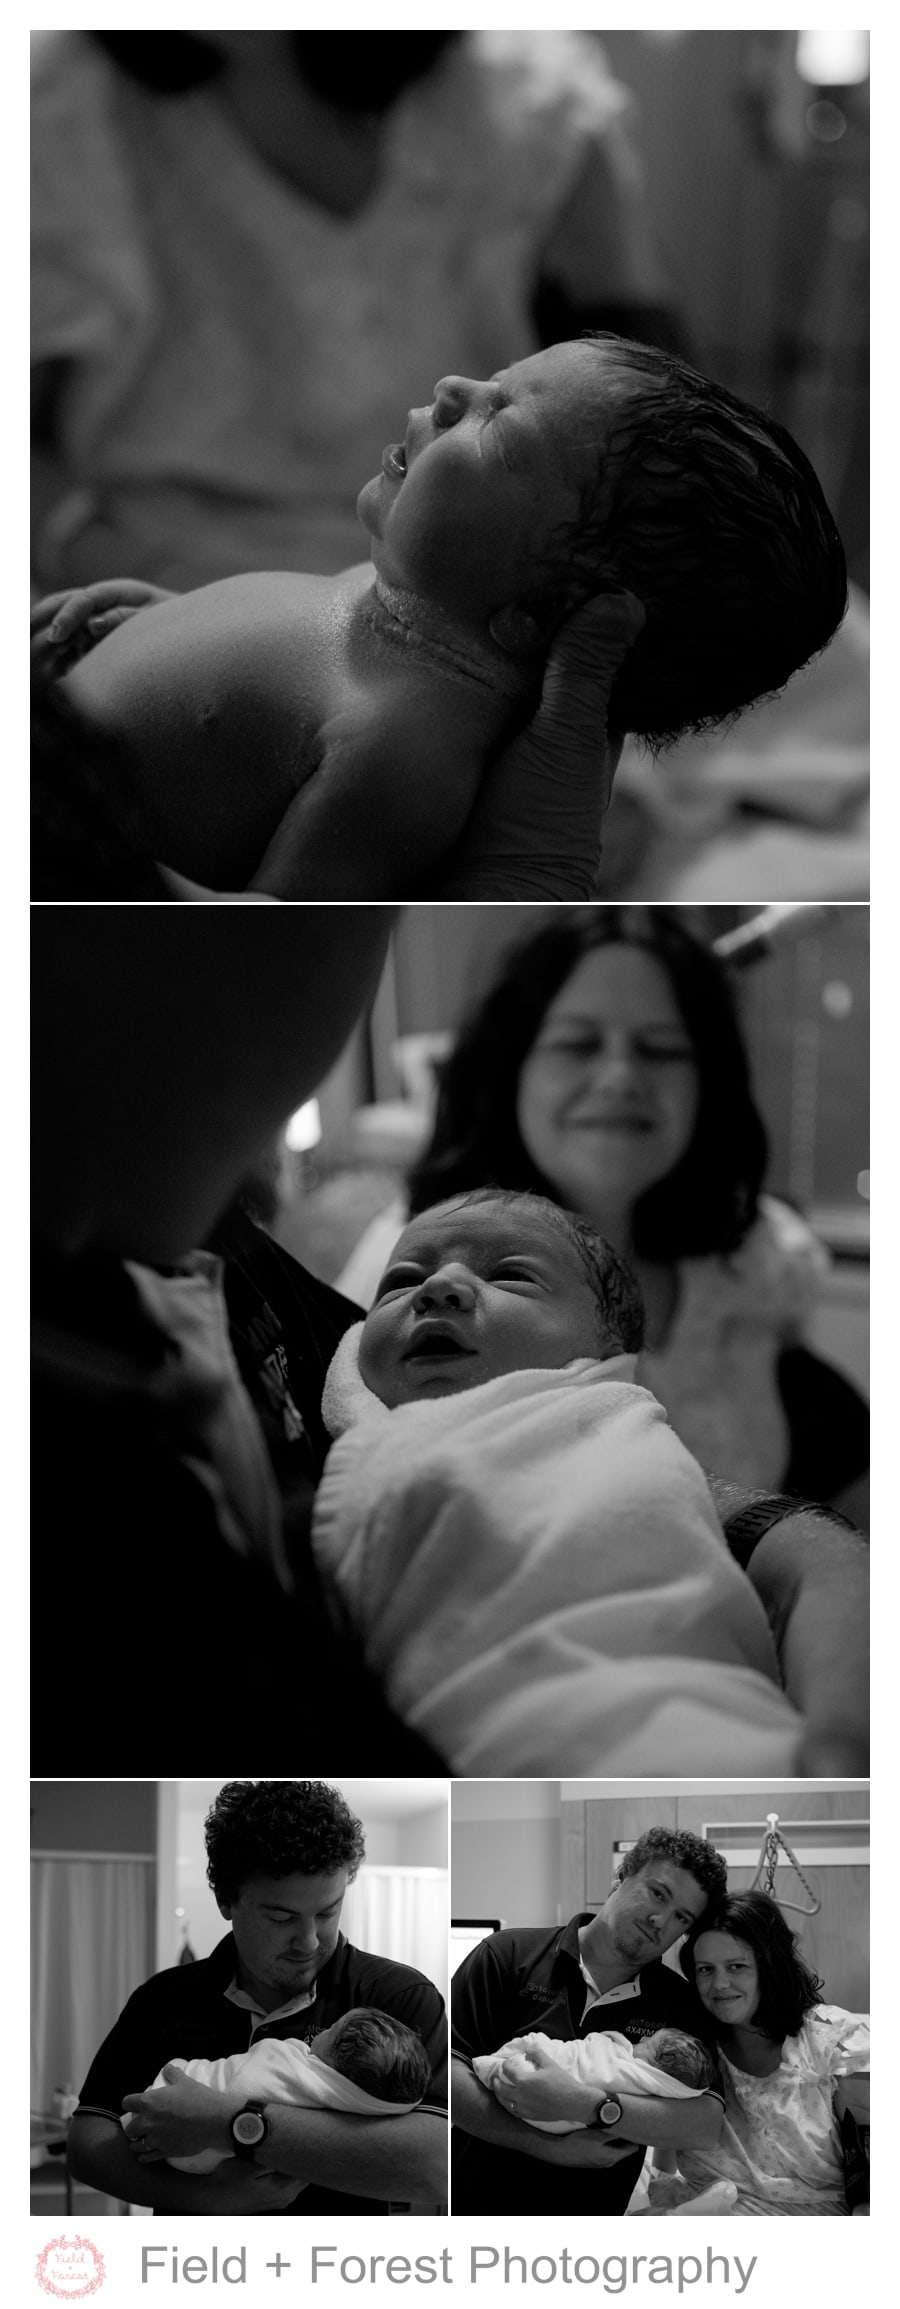 Birth Photography Brisbane Zack 5